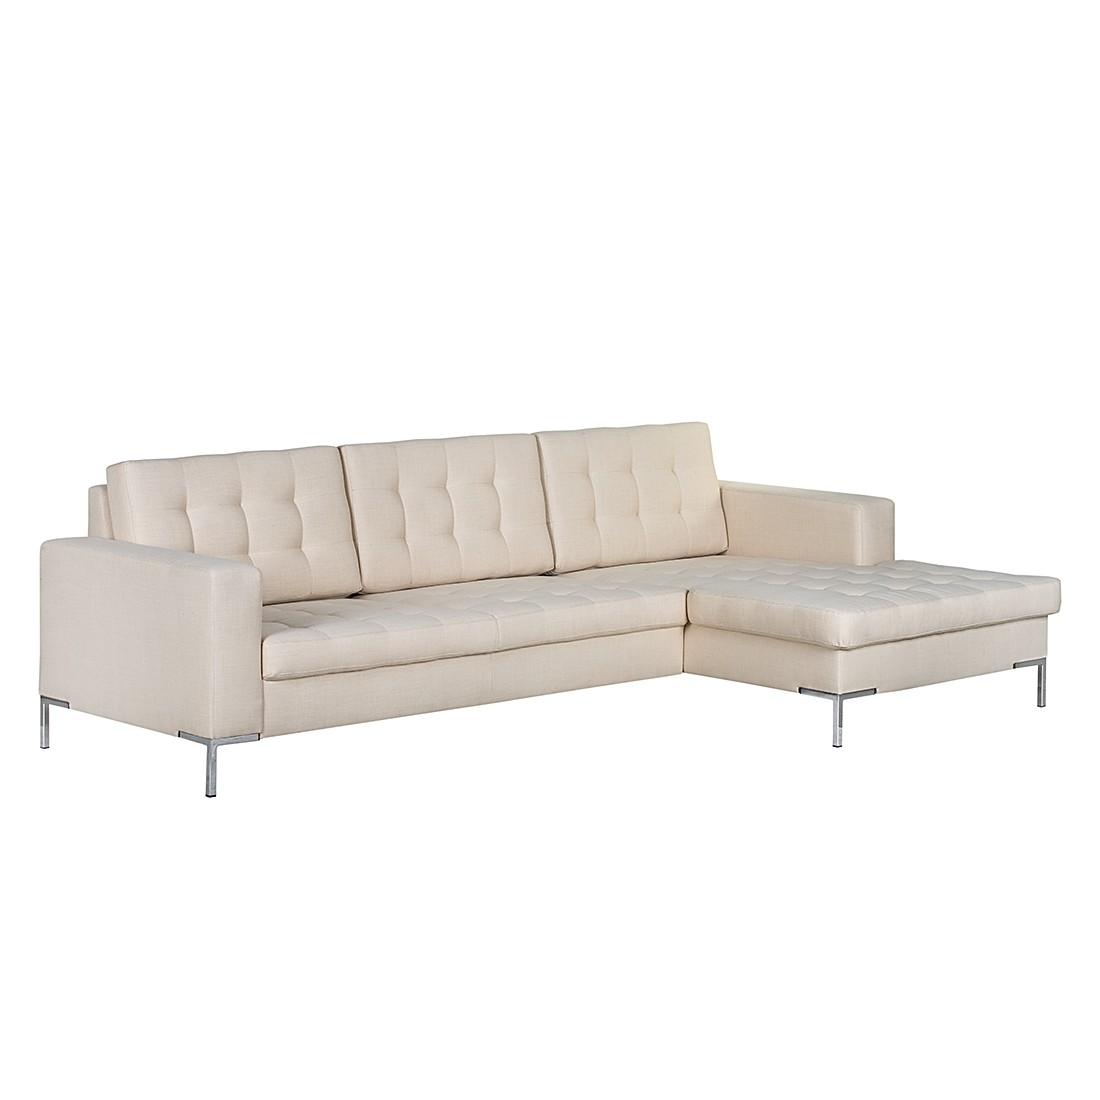 ecksofa nistra webstoff longchair ottomane davorstehend rechts beige fredriks bestellen. Black Bedroom Furniture Sets. Home Design Ideas